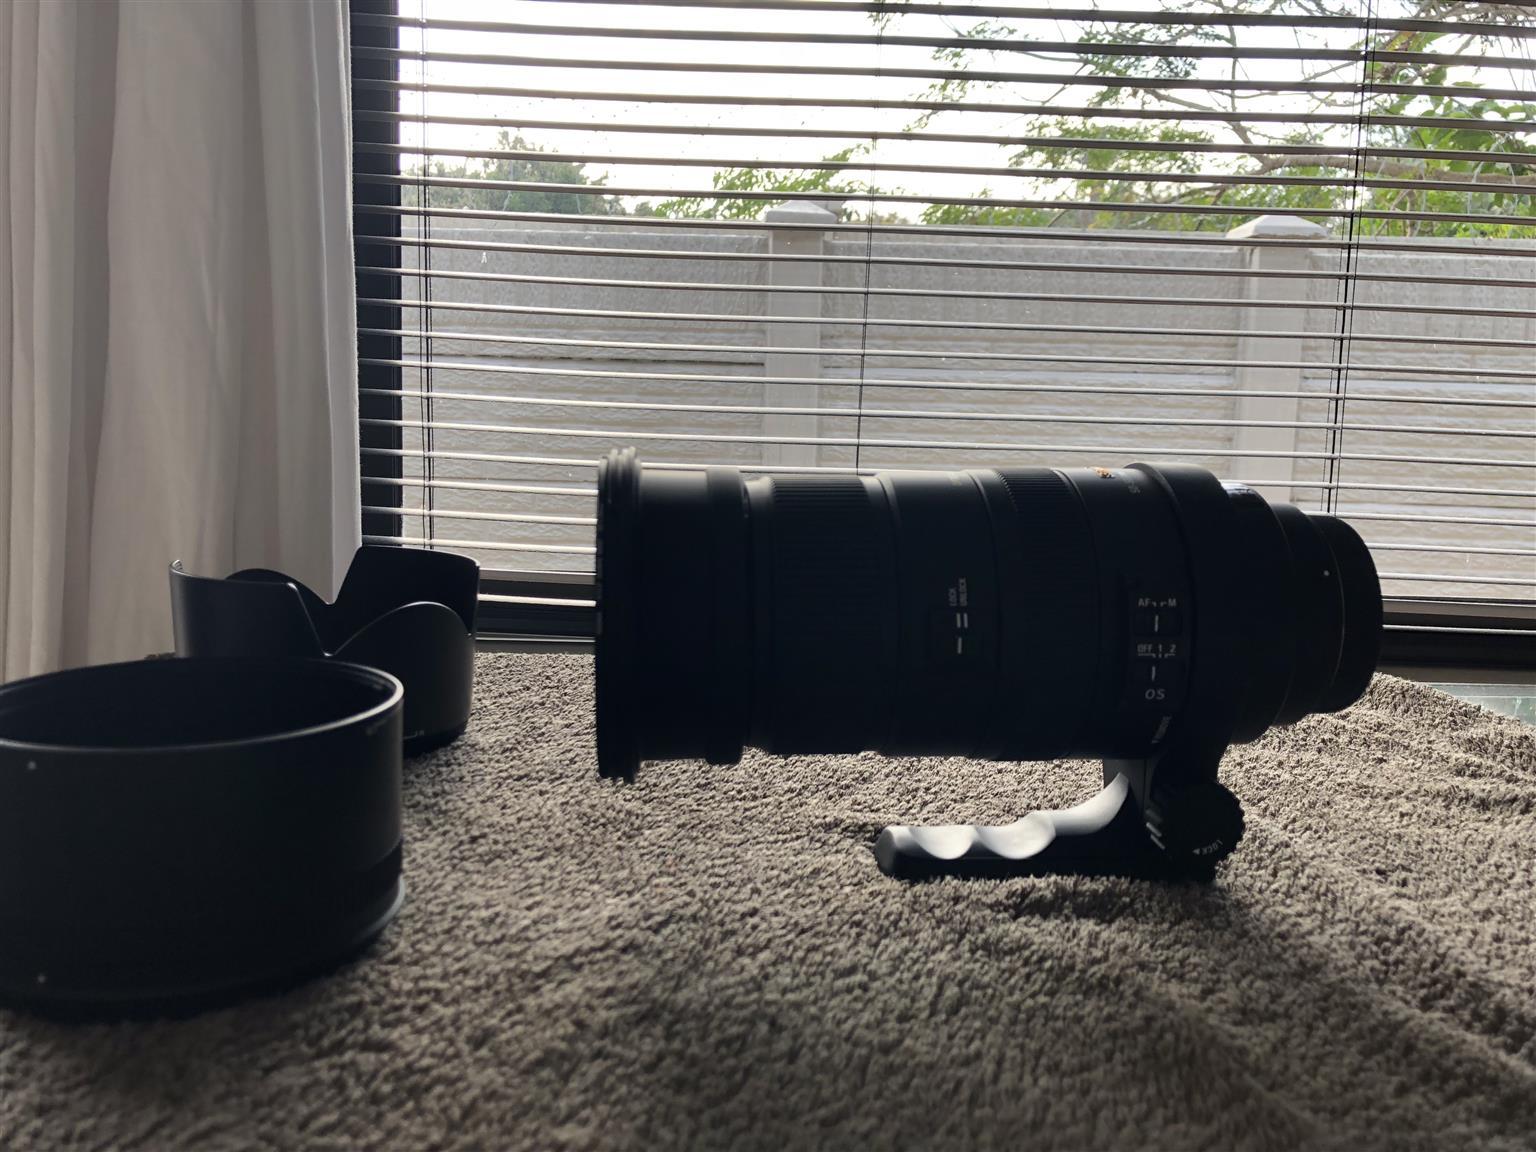 Sigma Canon mount 50-500mm